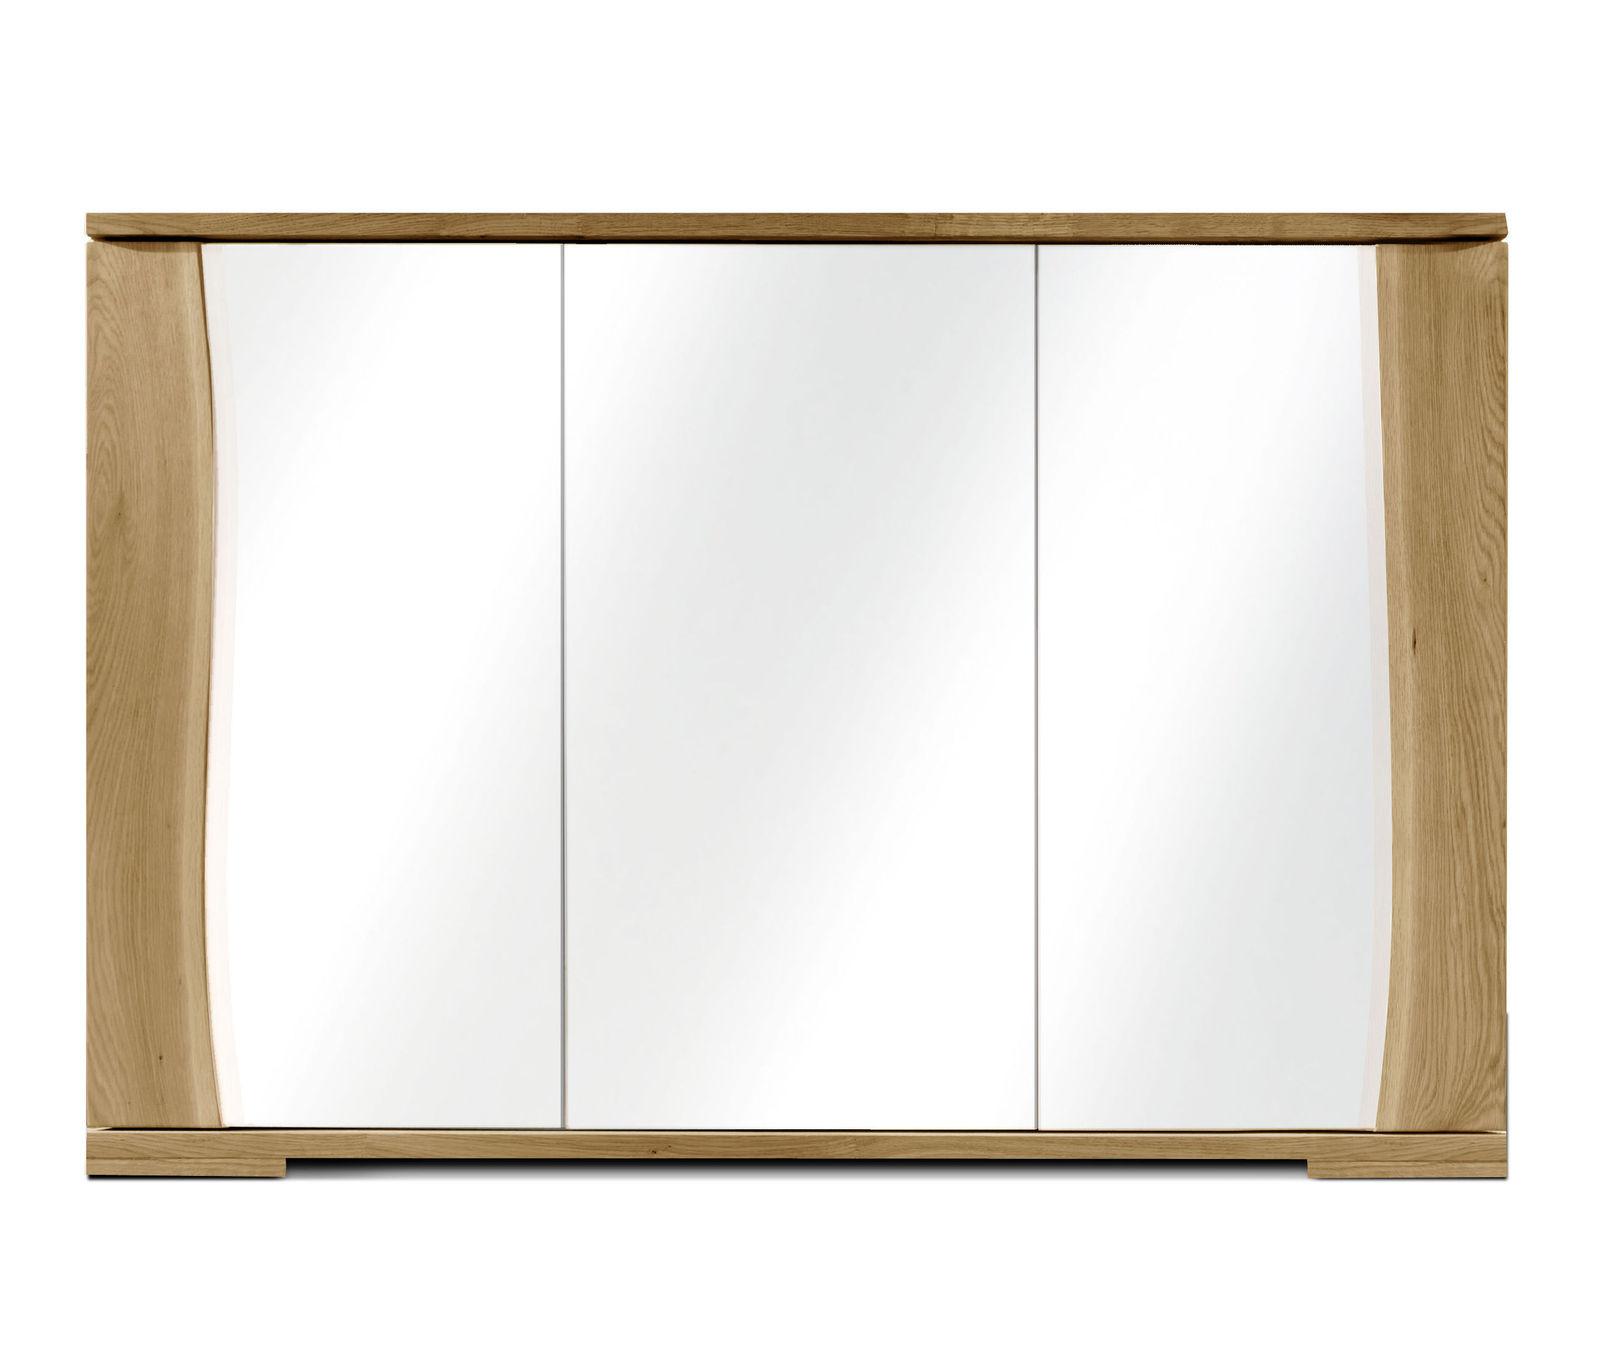 Rustikale massivholz kommode mit baumkante wildeiche ge lt for Kommode glasfront